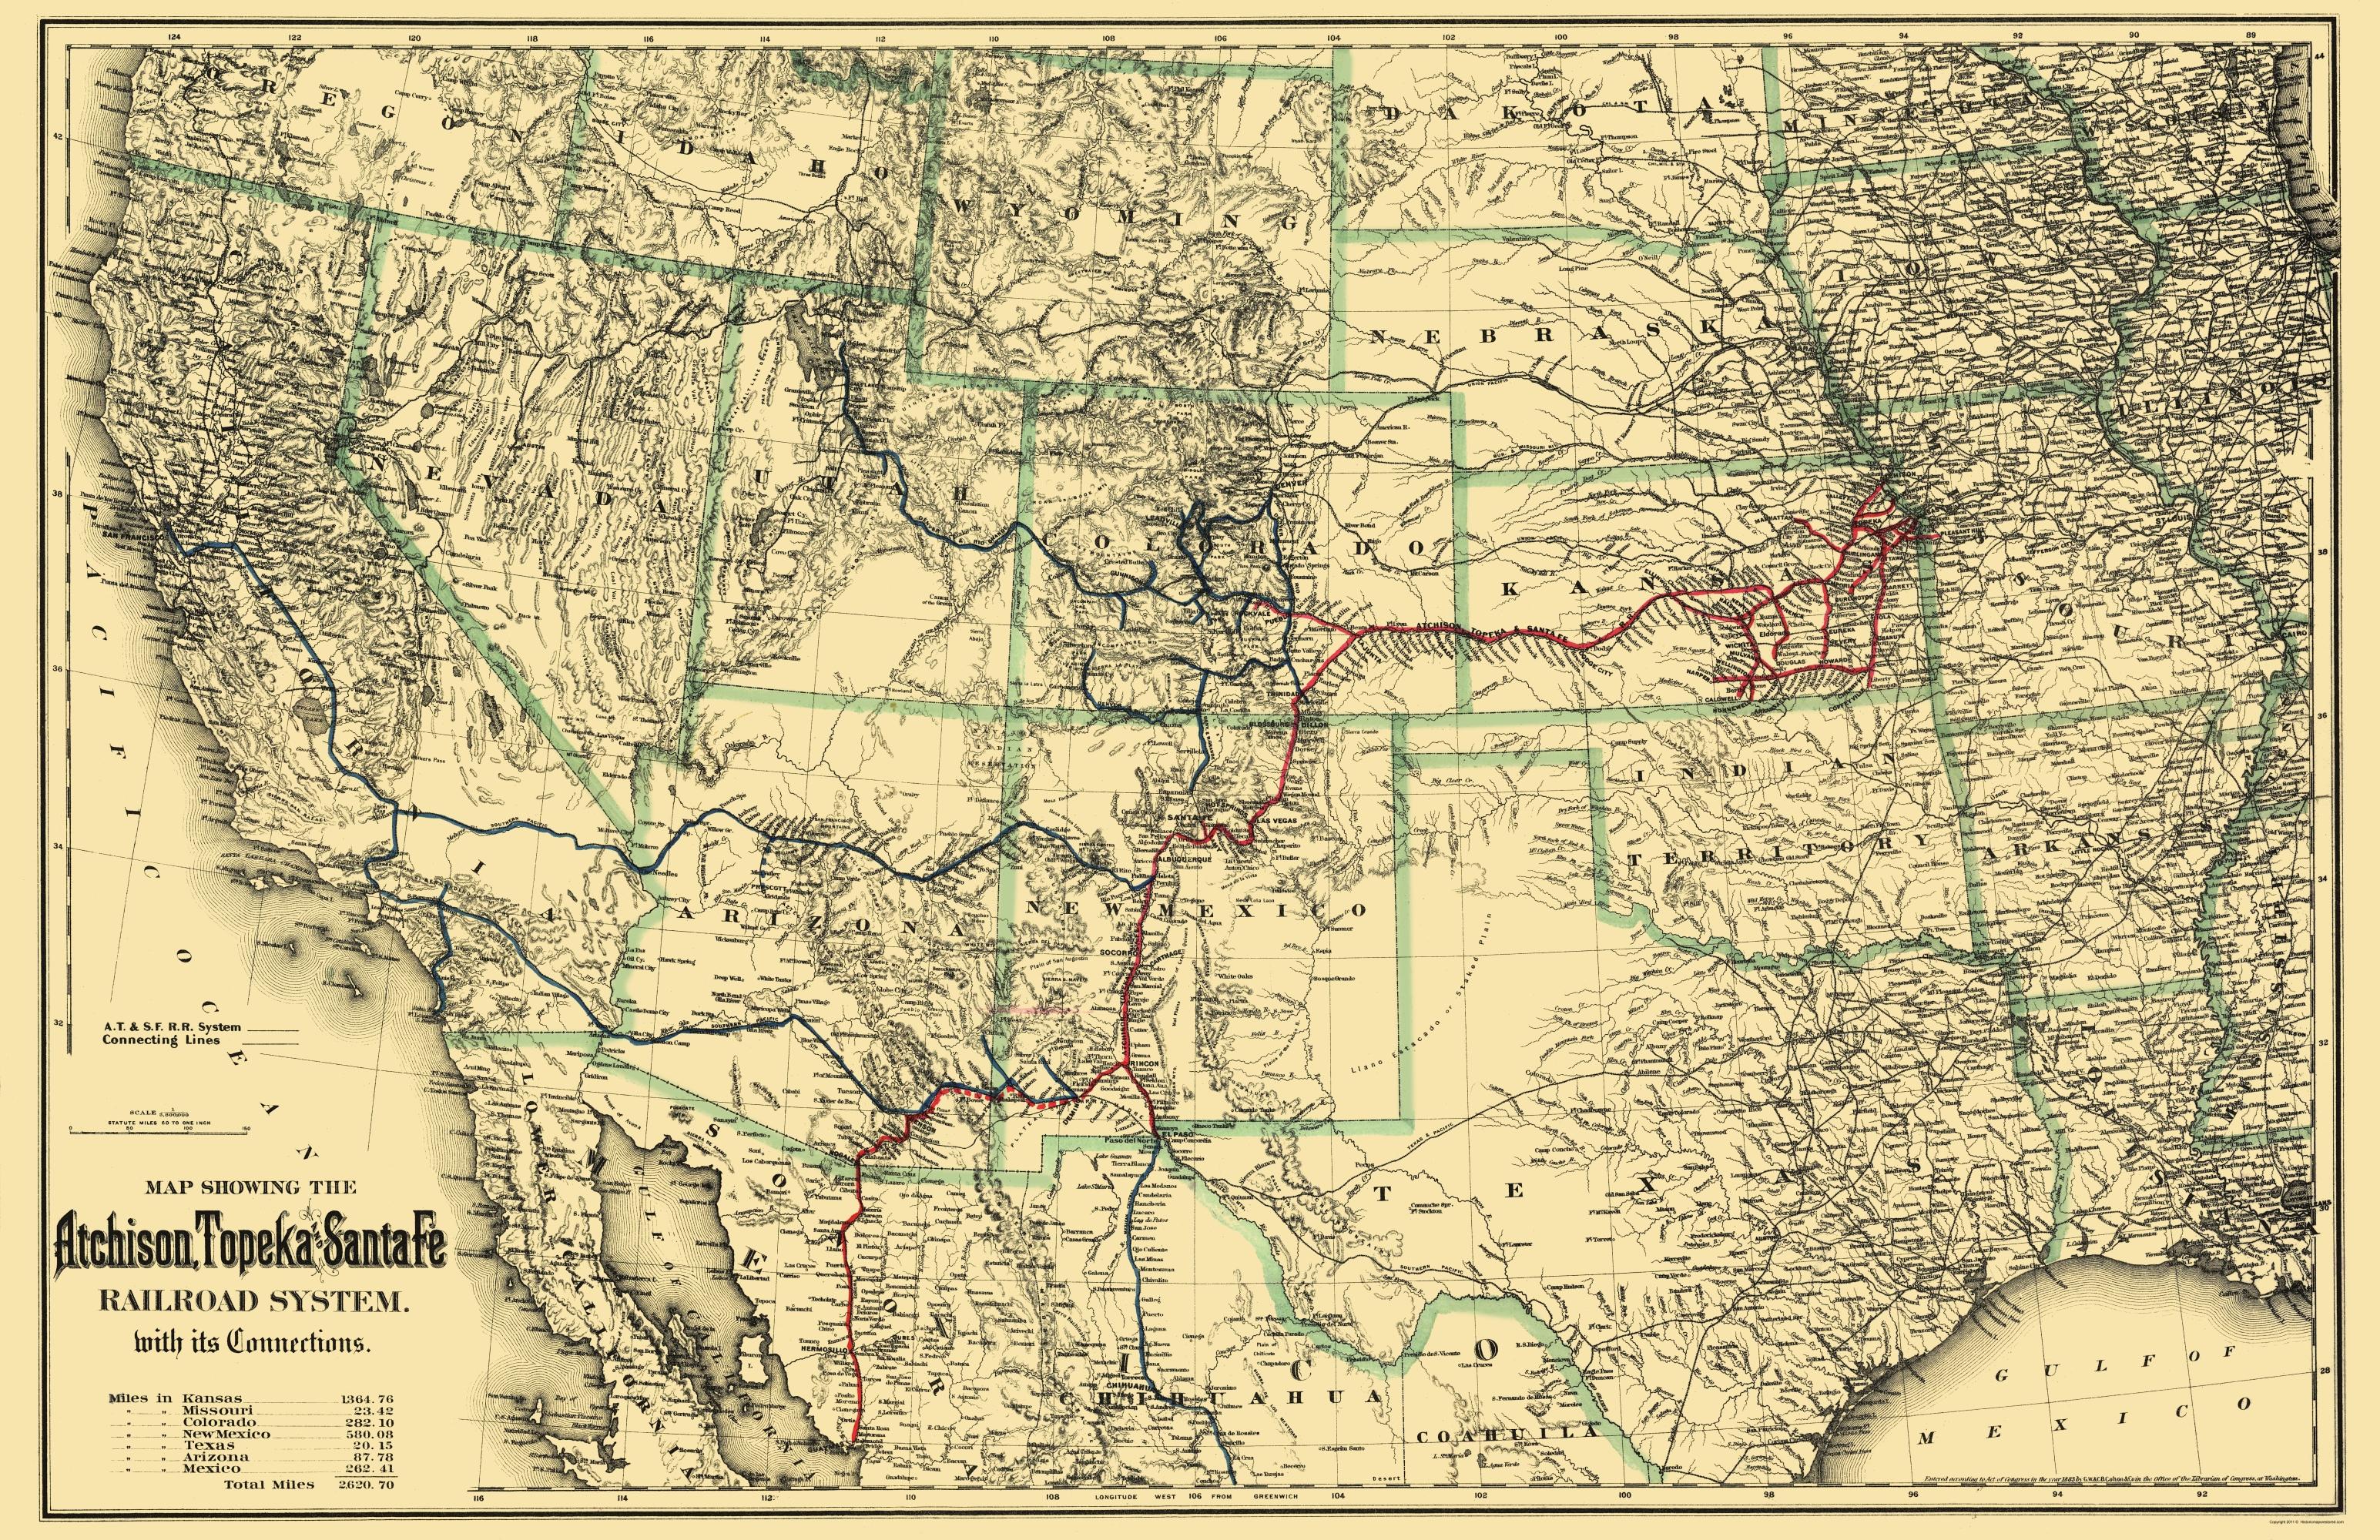 Old Map Atchison Topeka And Santa Fe Railroad System - Atchinson topeka and santa ferailroad on the us map